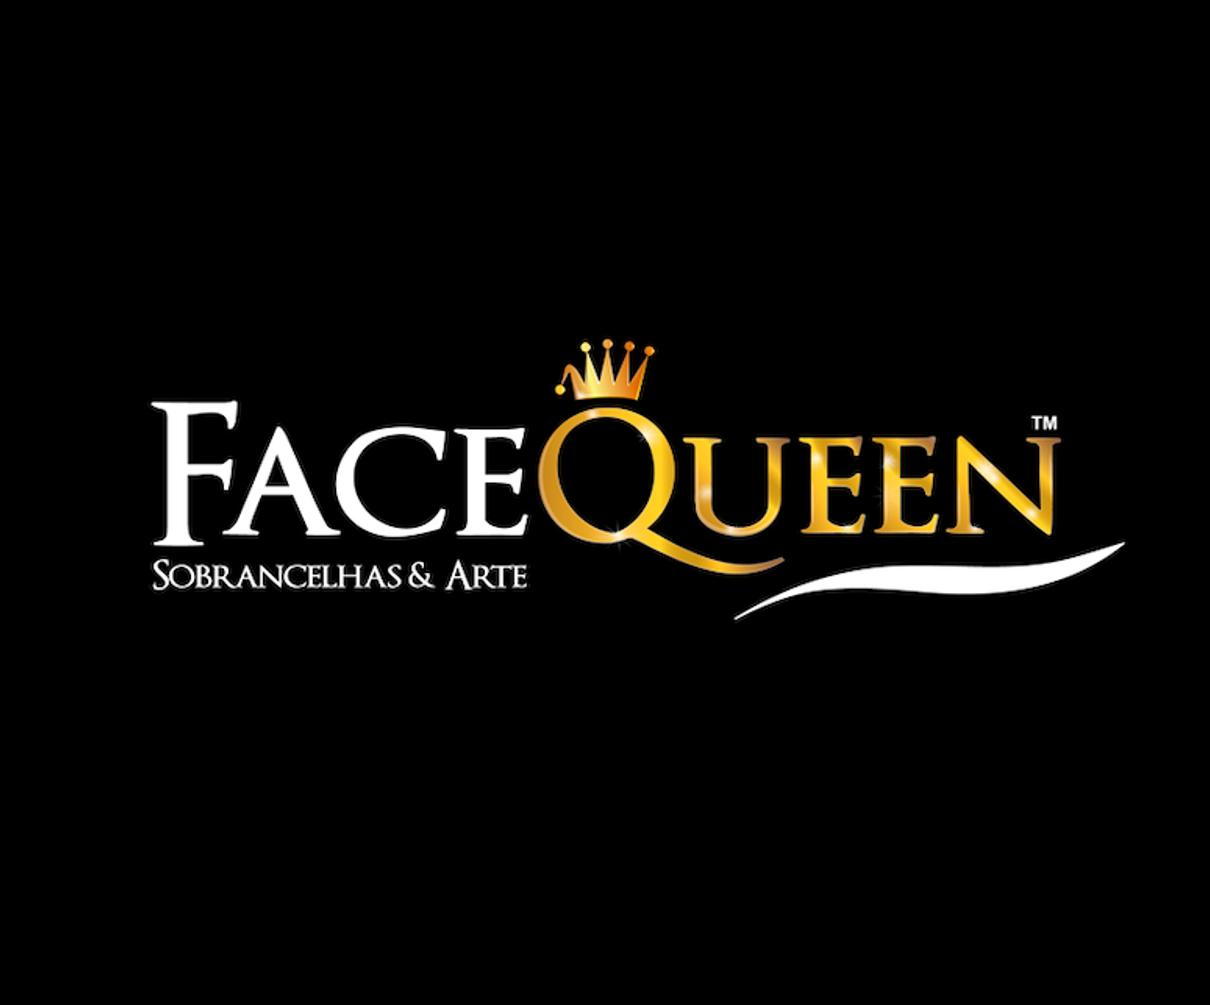 FaceQueen